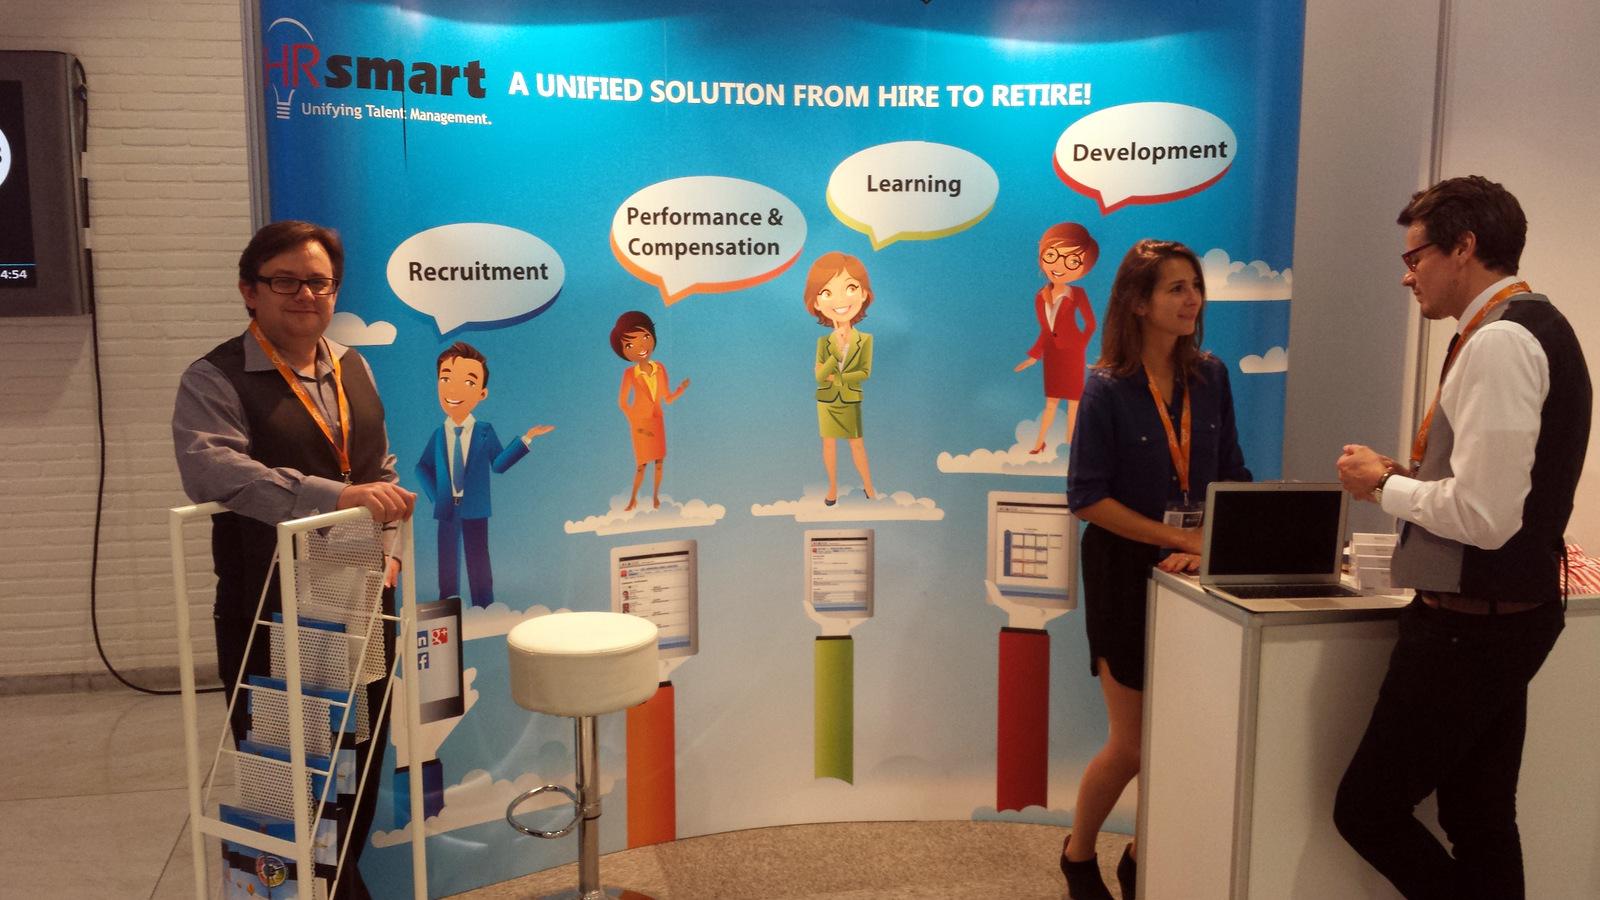 Nigel-Goodwin-&-Elise-Carbone-Demiraj-HRsmart-booth-@-HR-Tech-Europe-2014